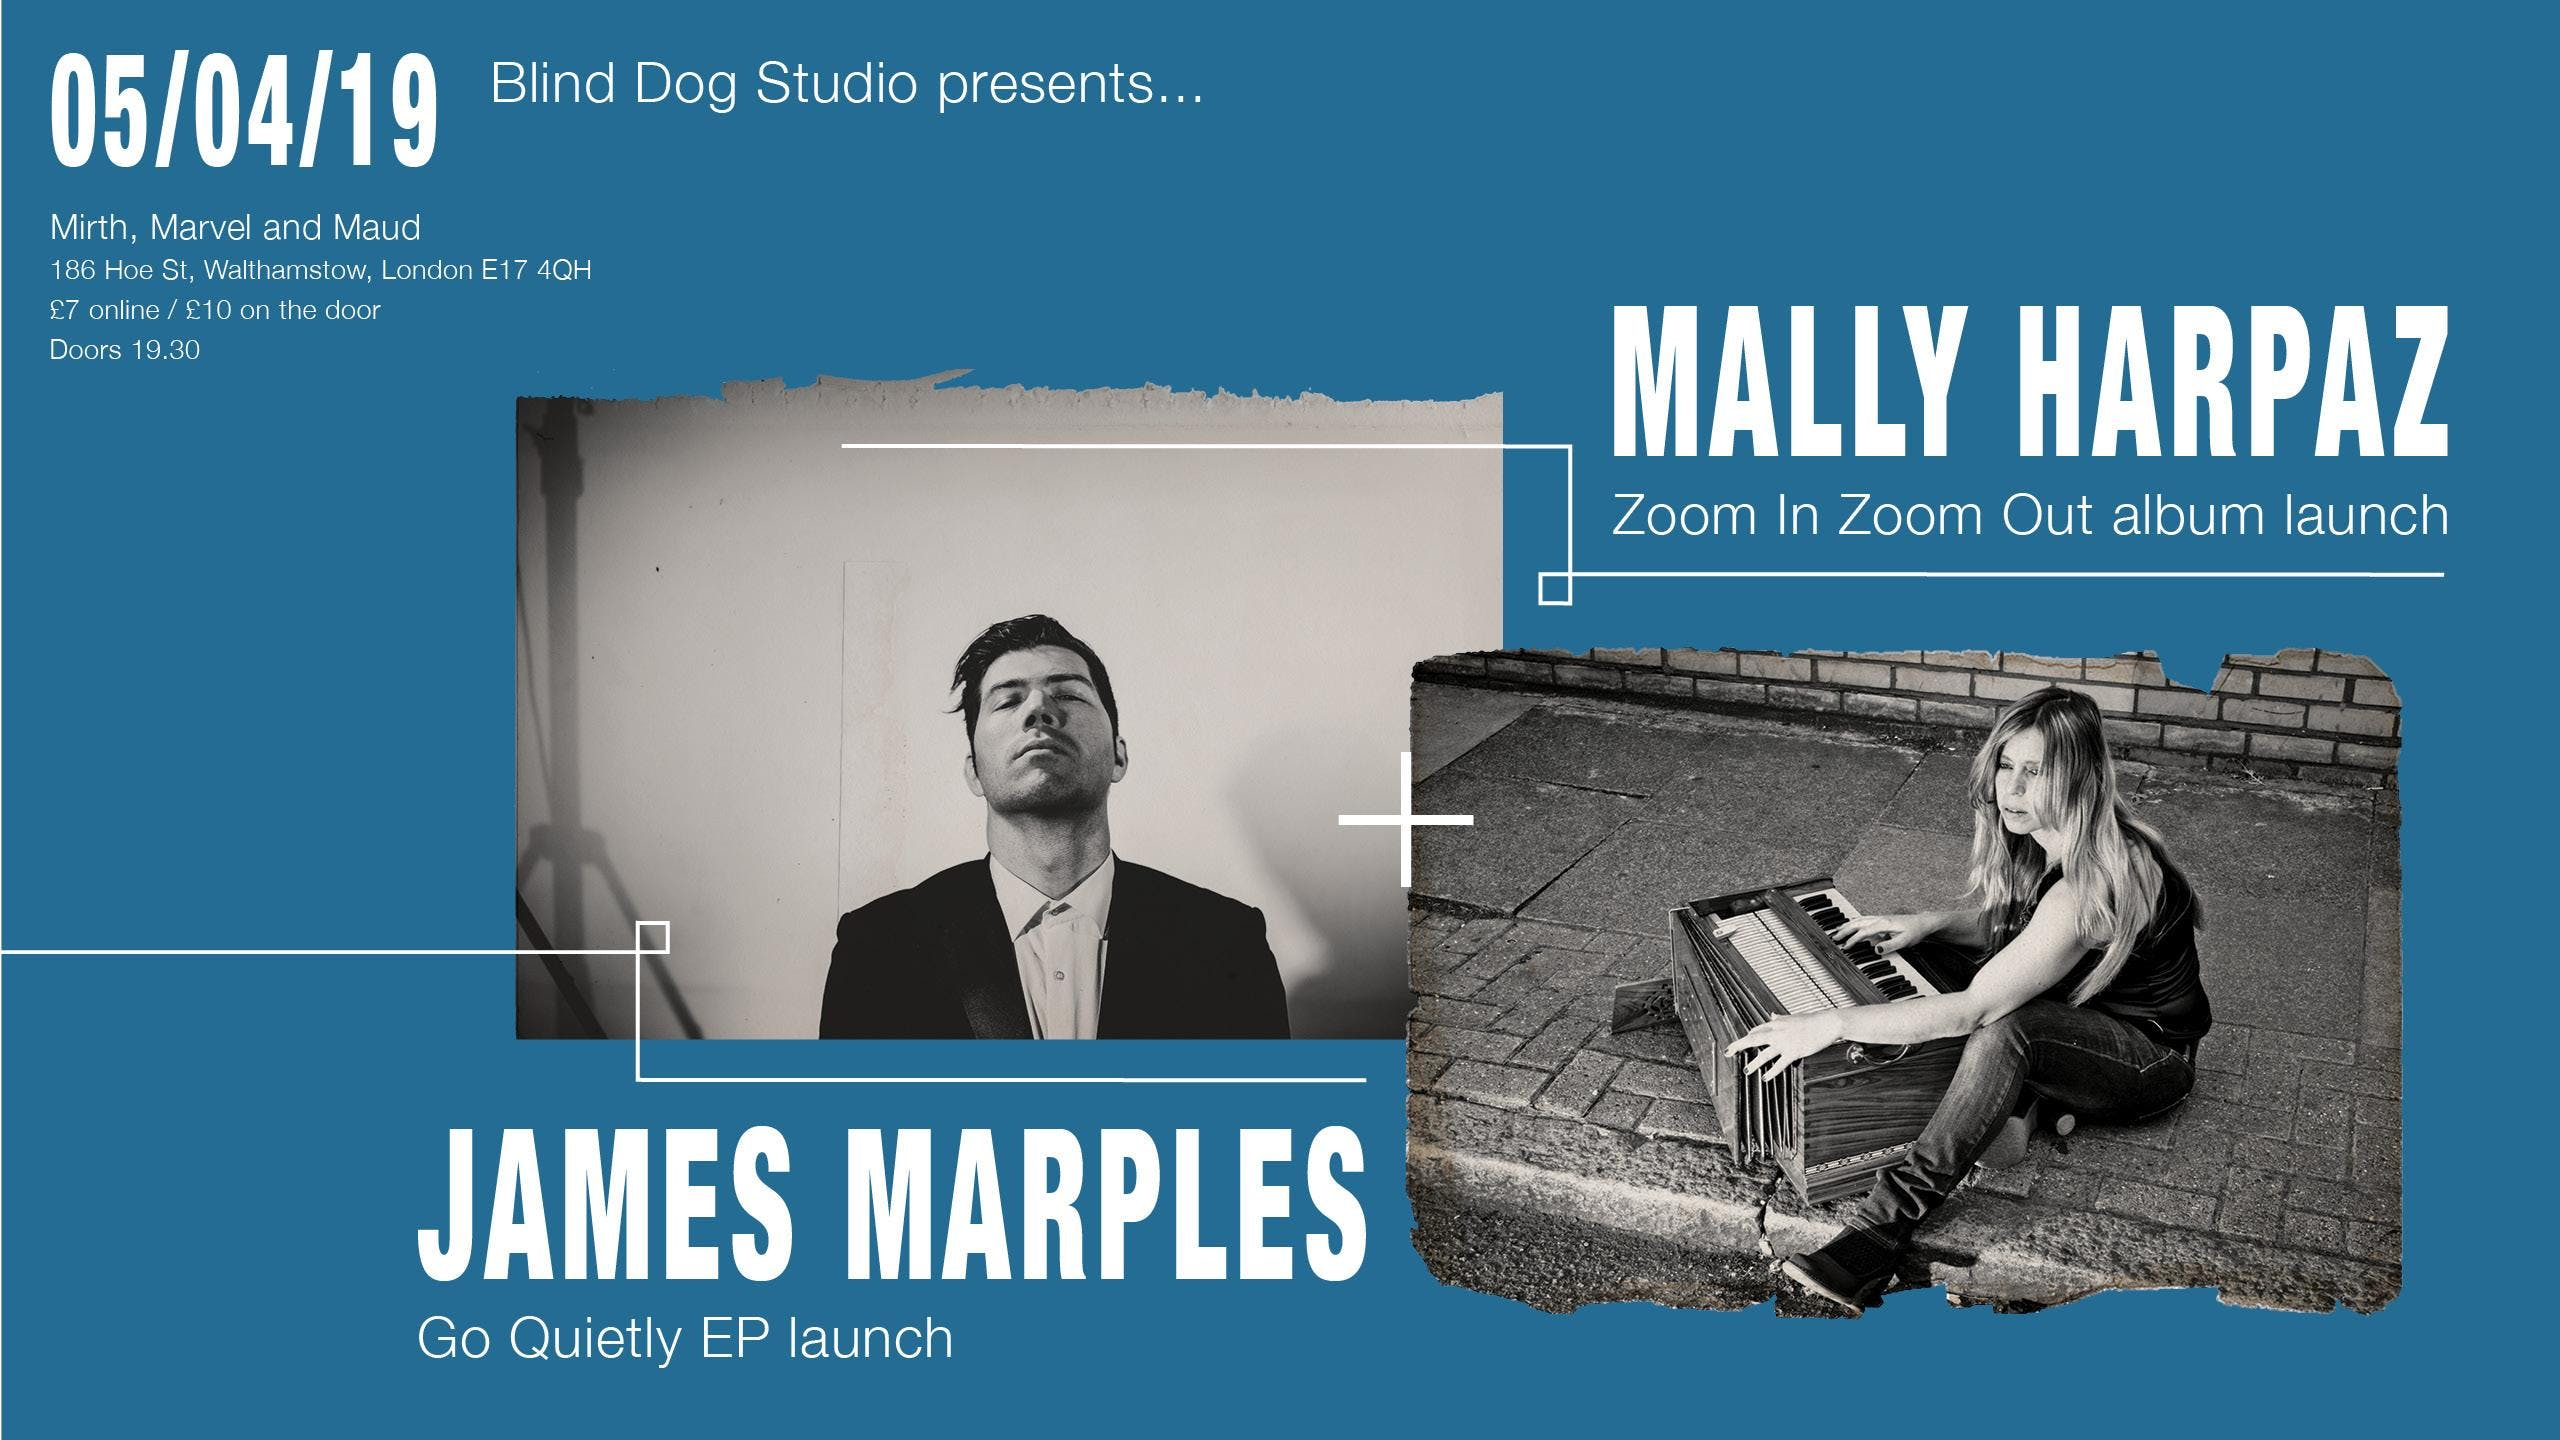 MALLY HARPAZ  + JAMES MARPLES  / ALBUM + EP LAUNCH